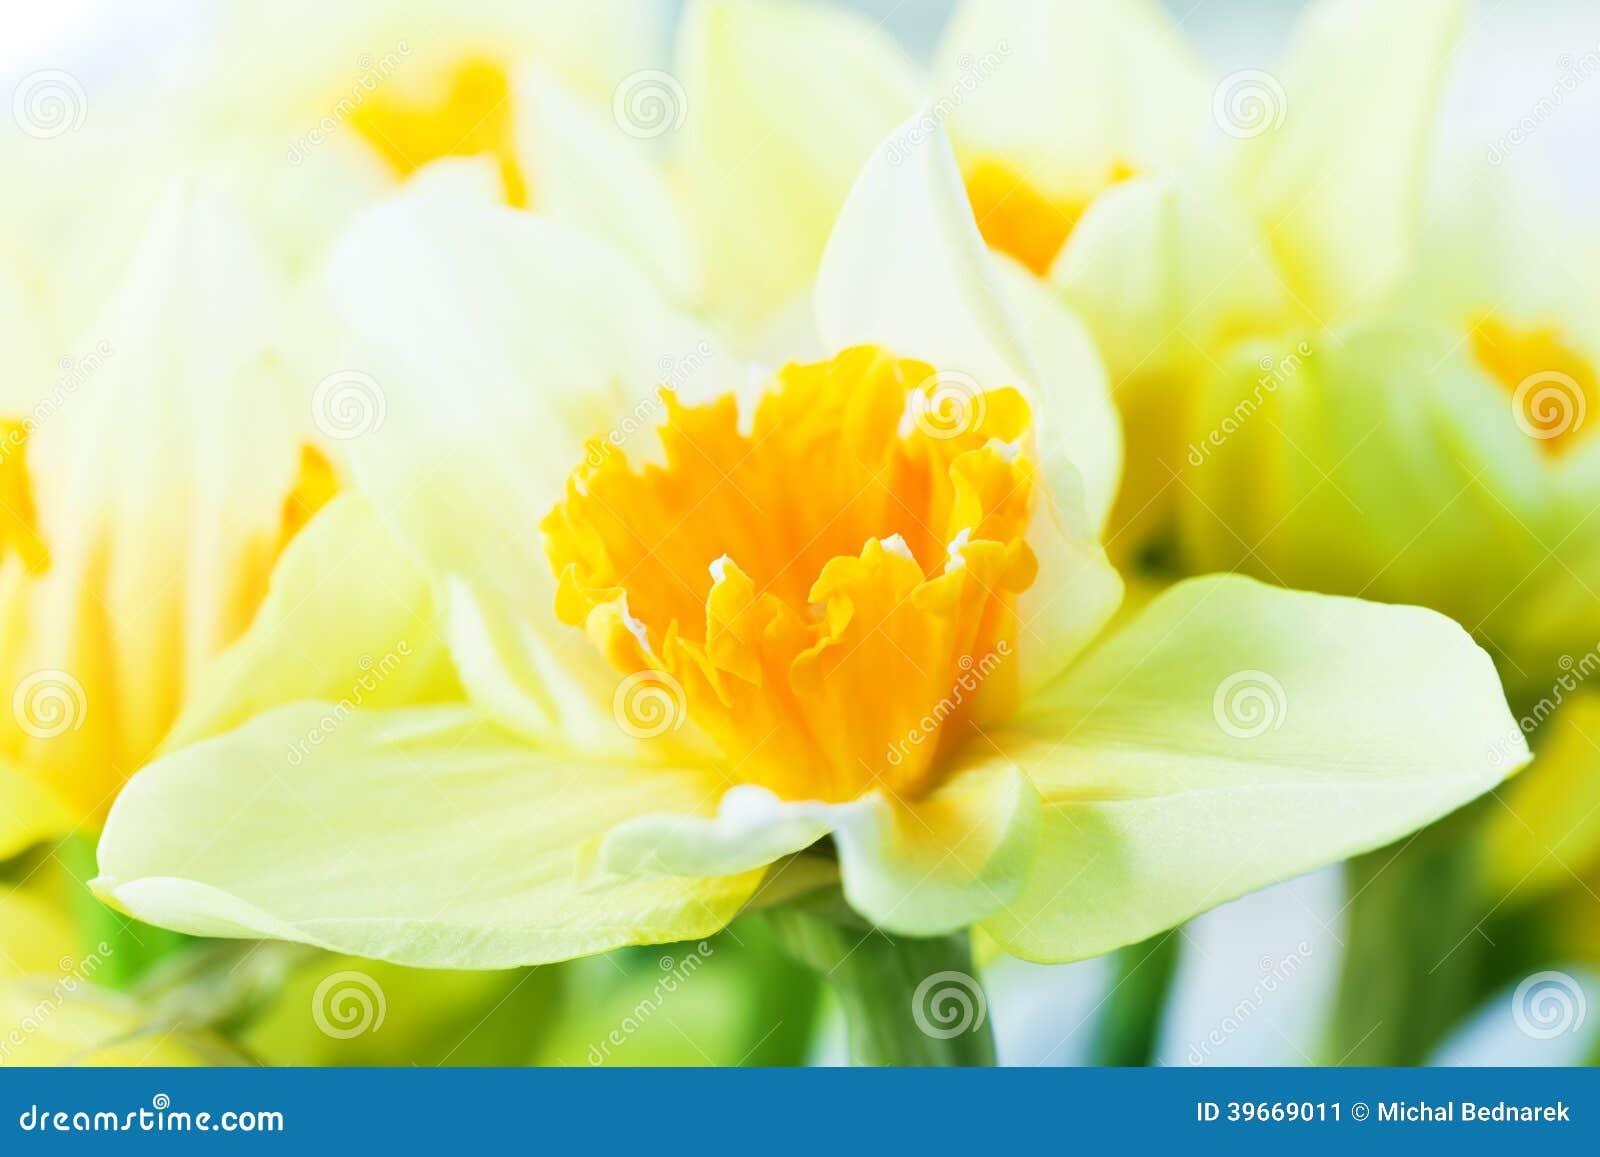 Macro image of spring flower, jonquil, daffodil.